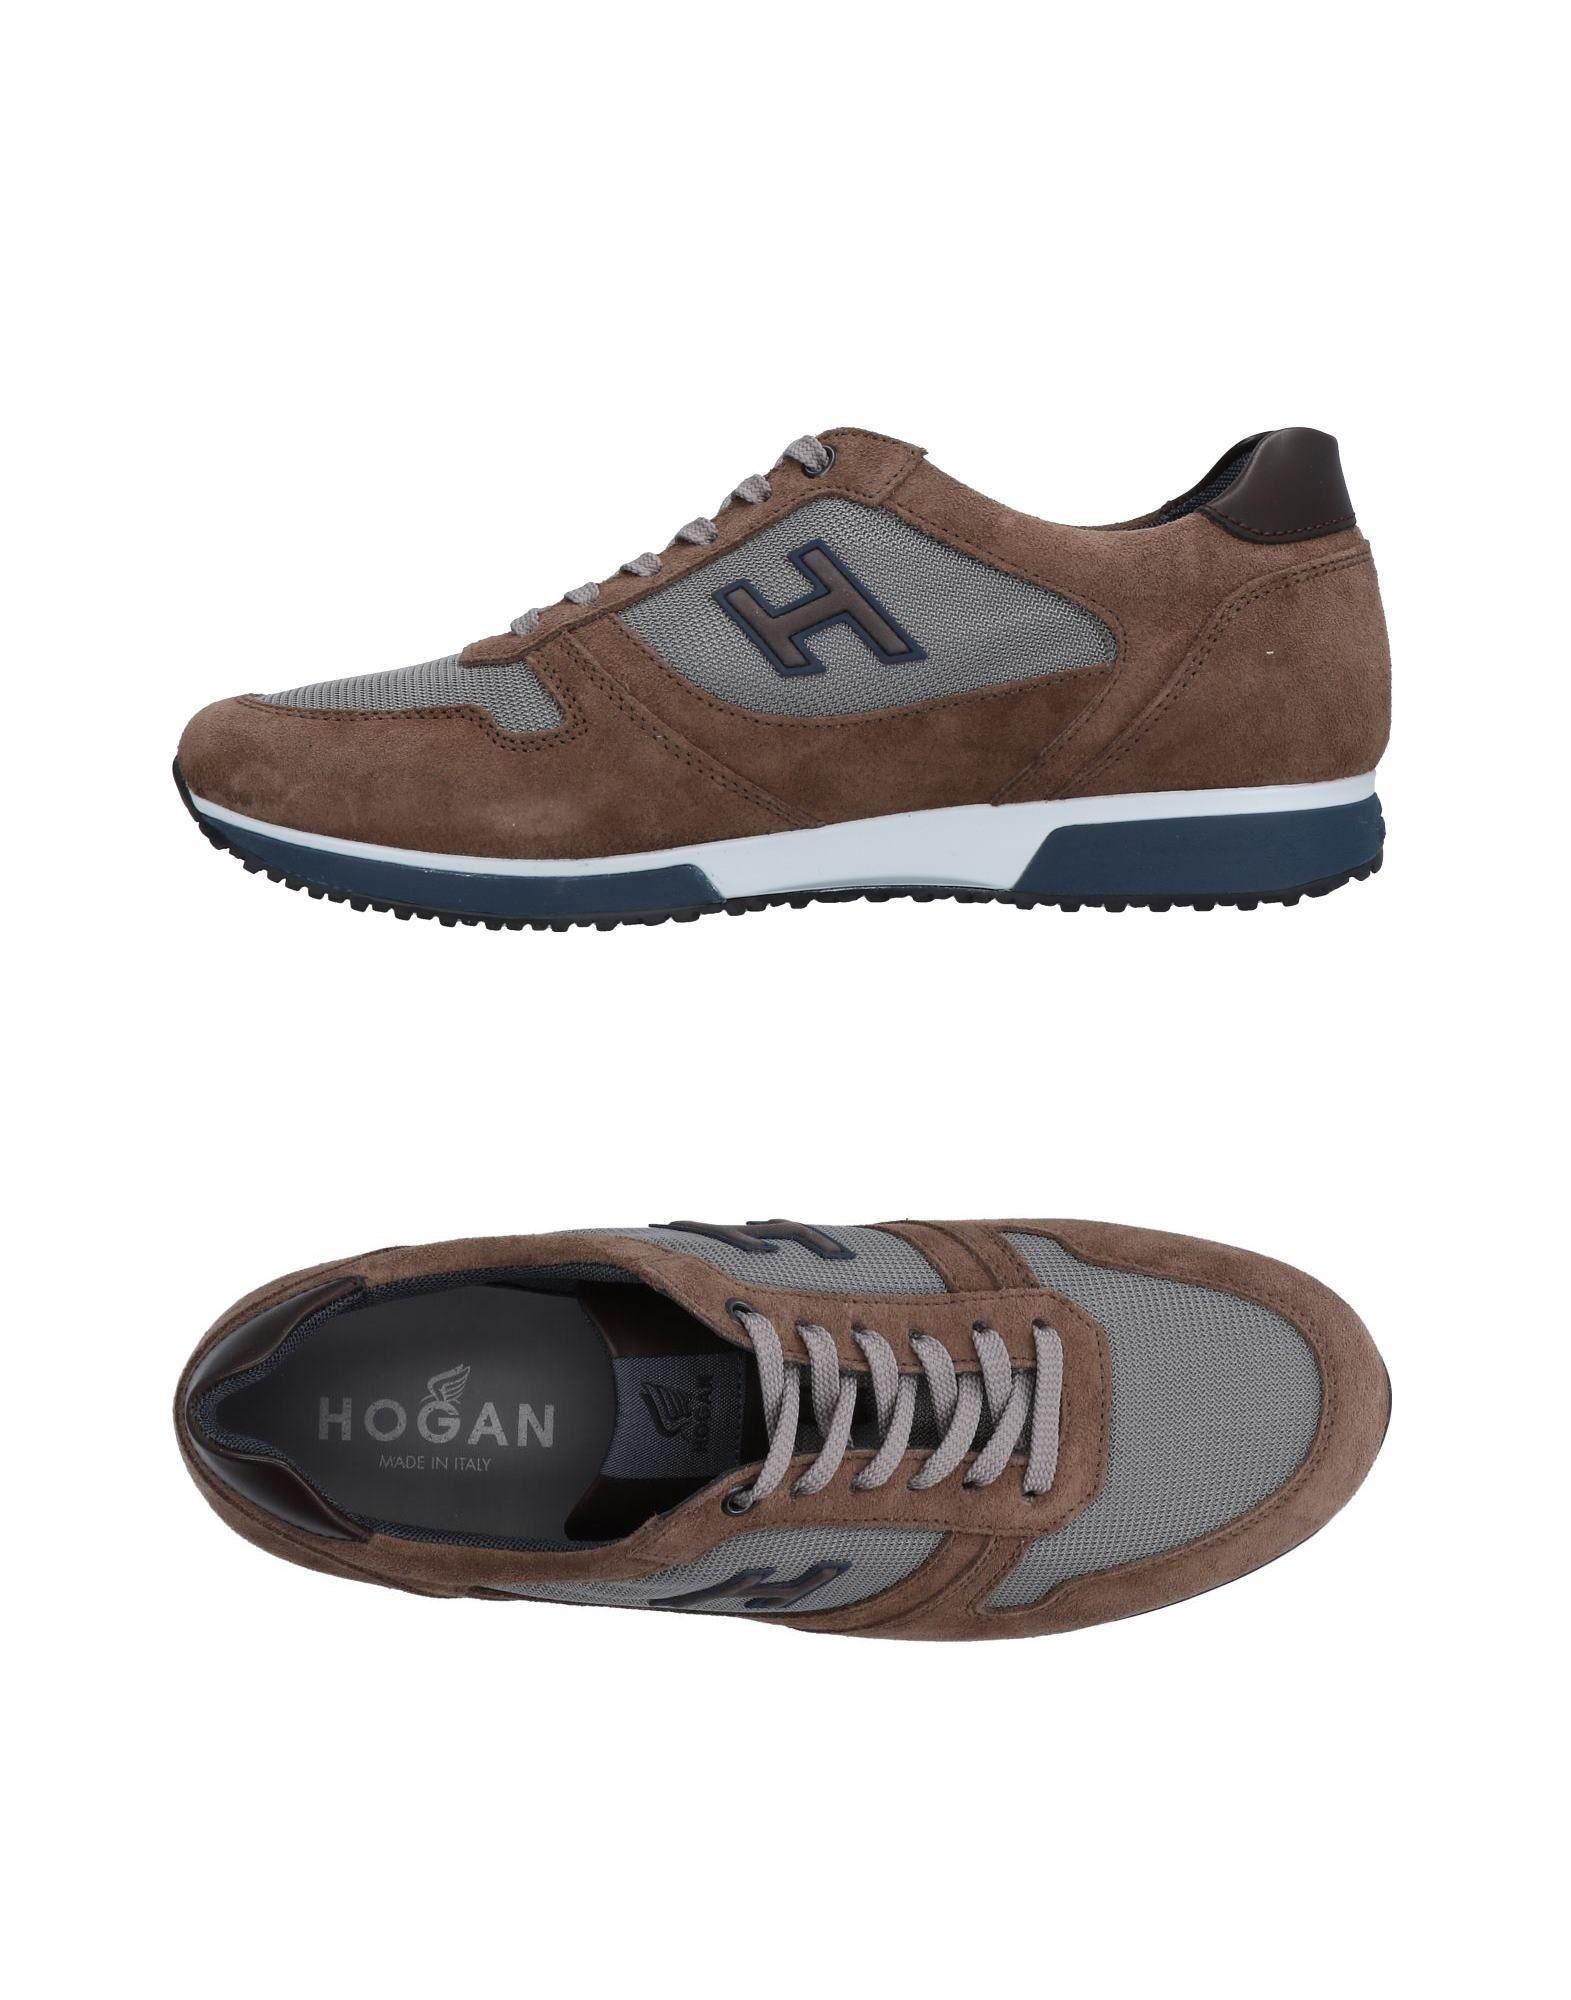 Moda Sneakers Tod's Uomo - 11511815OF